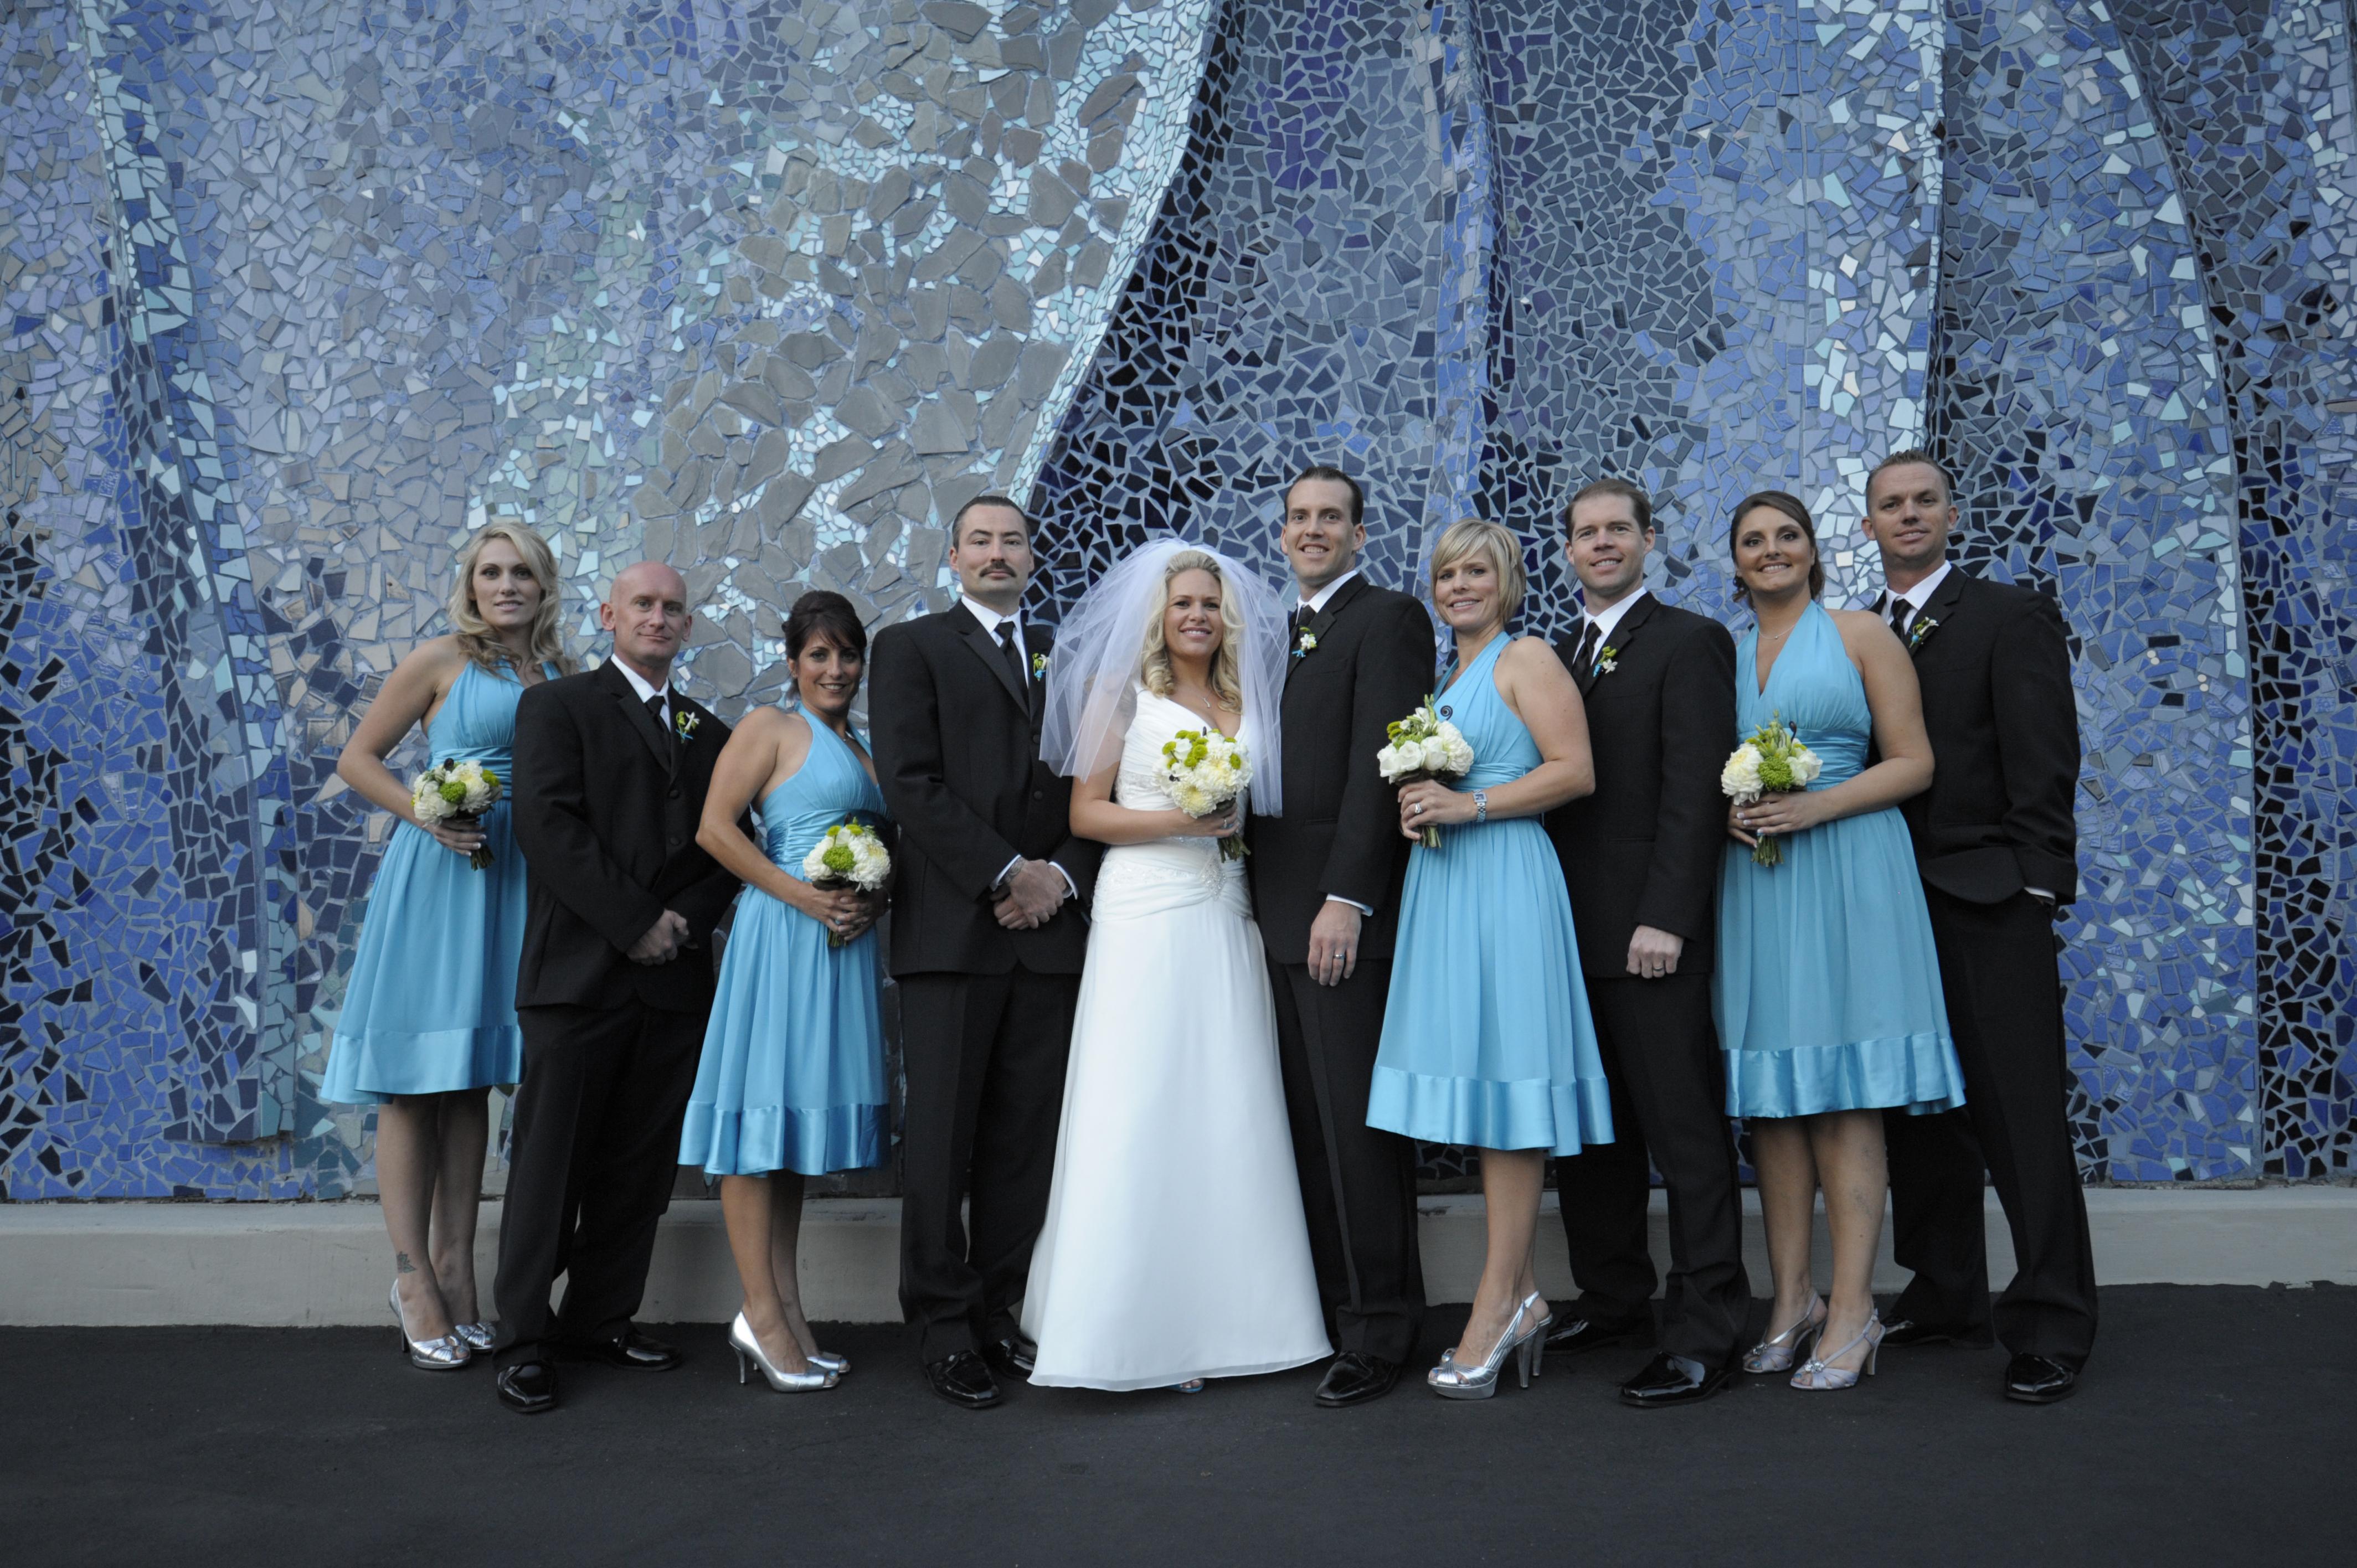 Bridesmaids, Bridesmaids Dresses, Fashion, Groomsmen